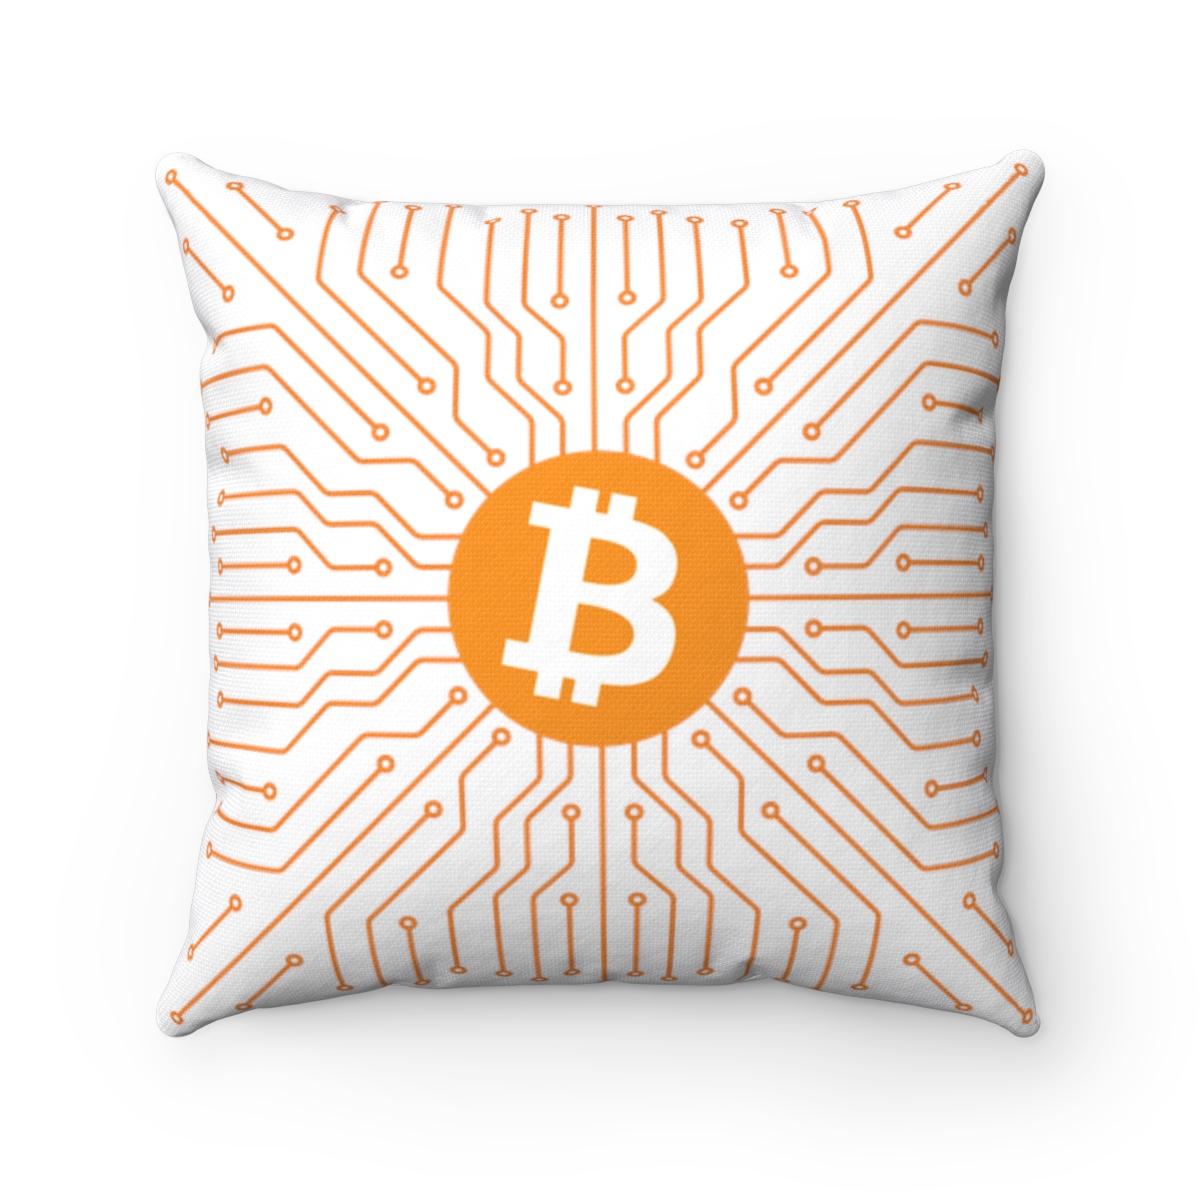 Bitcoin Square Pillow